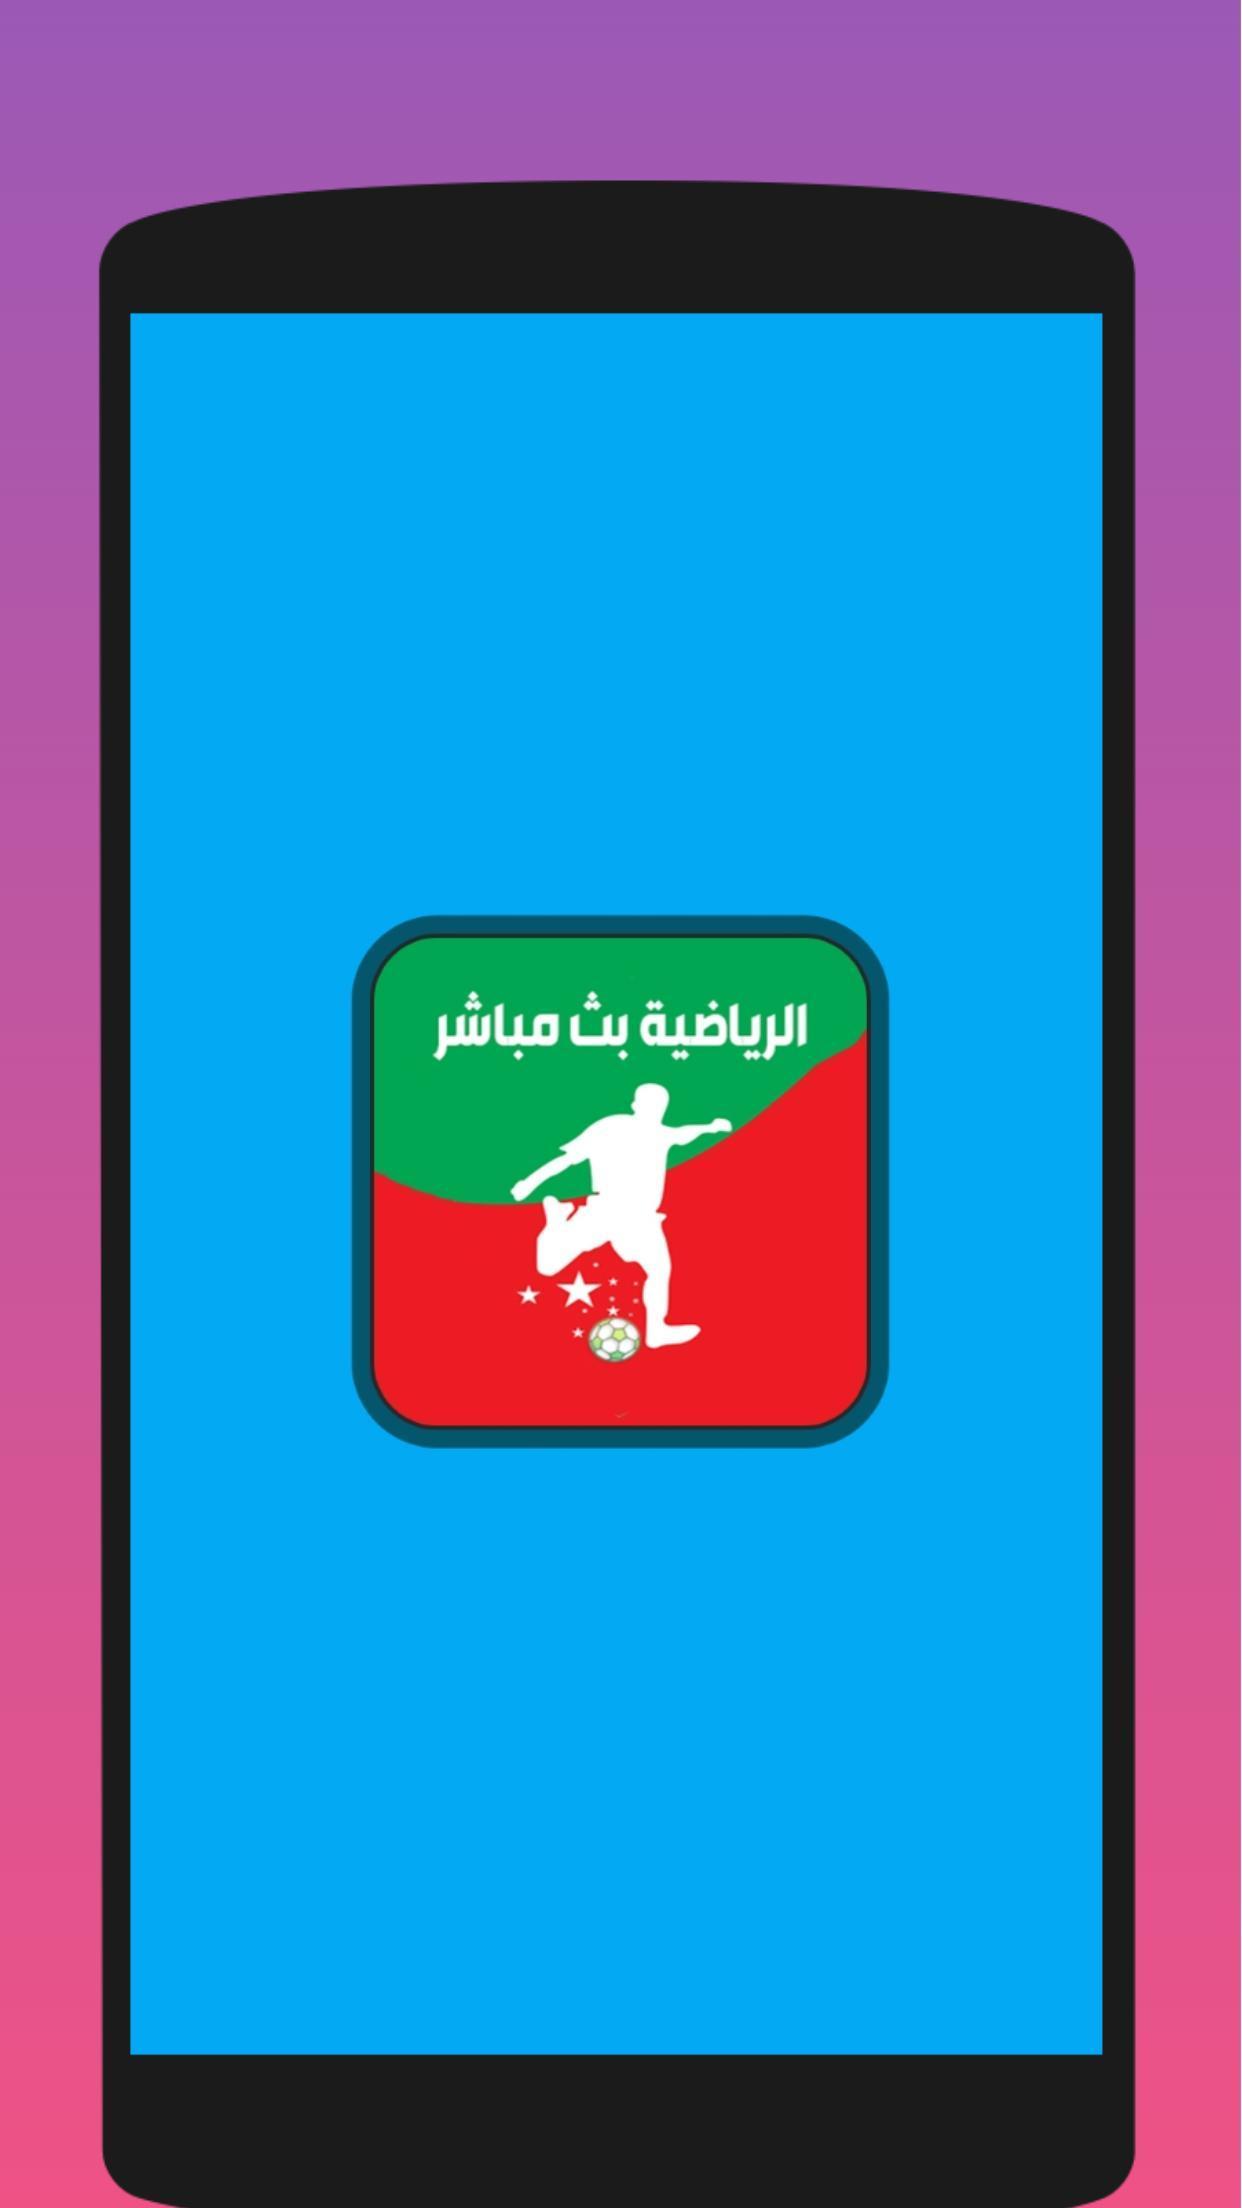 Arryadia Hd Live Tv الرياضية المغربية بث مباشر For Android Apk Download